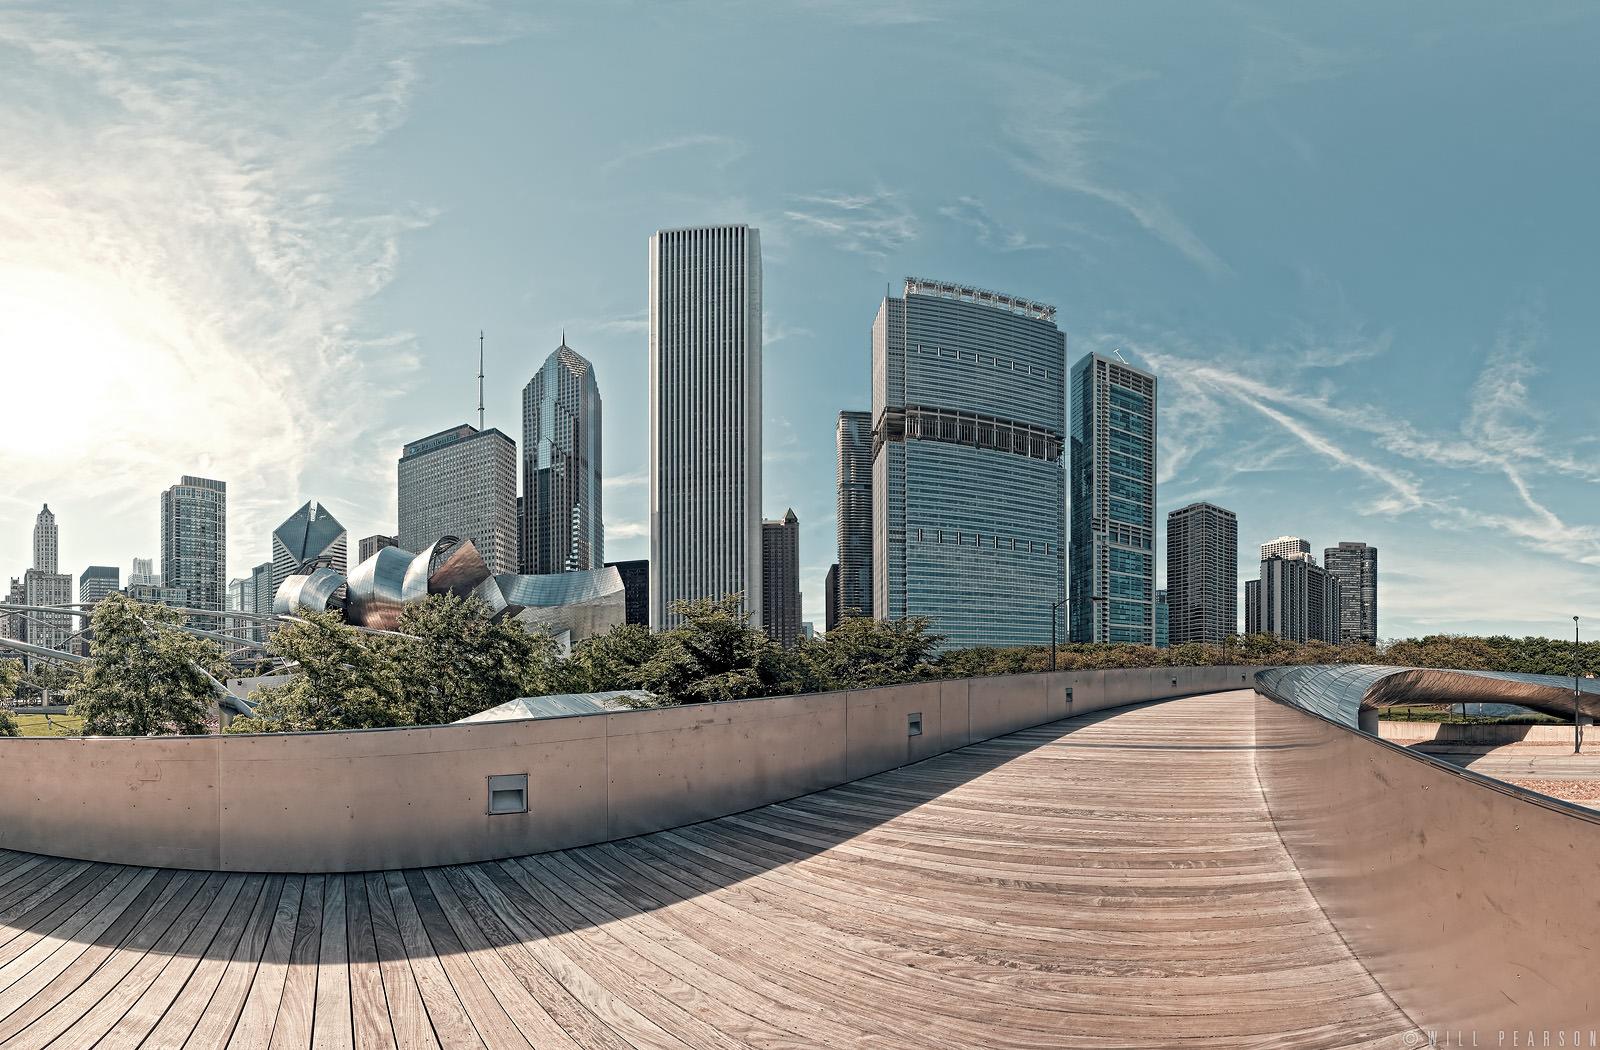 chicago backlight bridge - photo #40